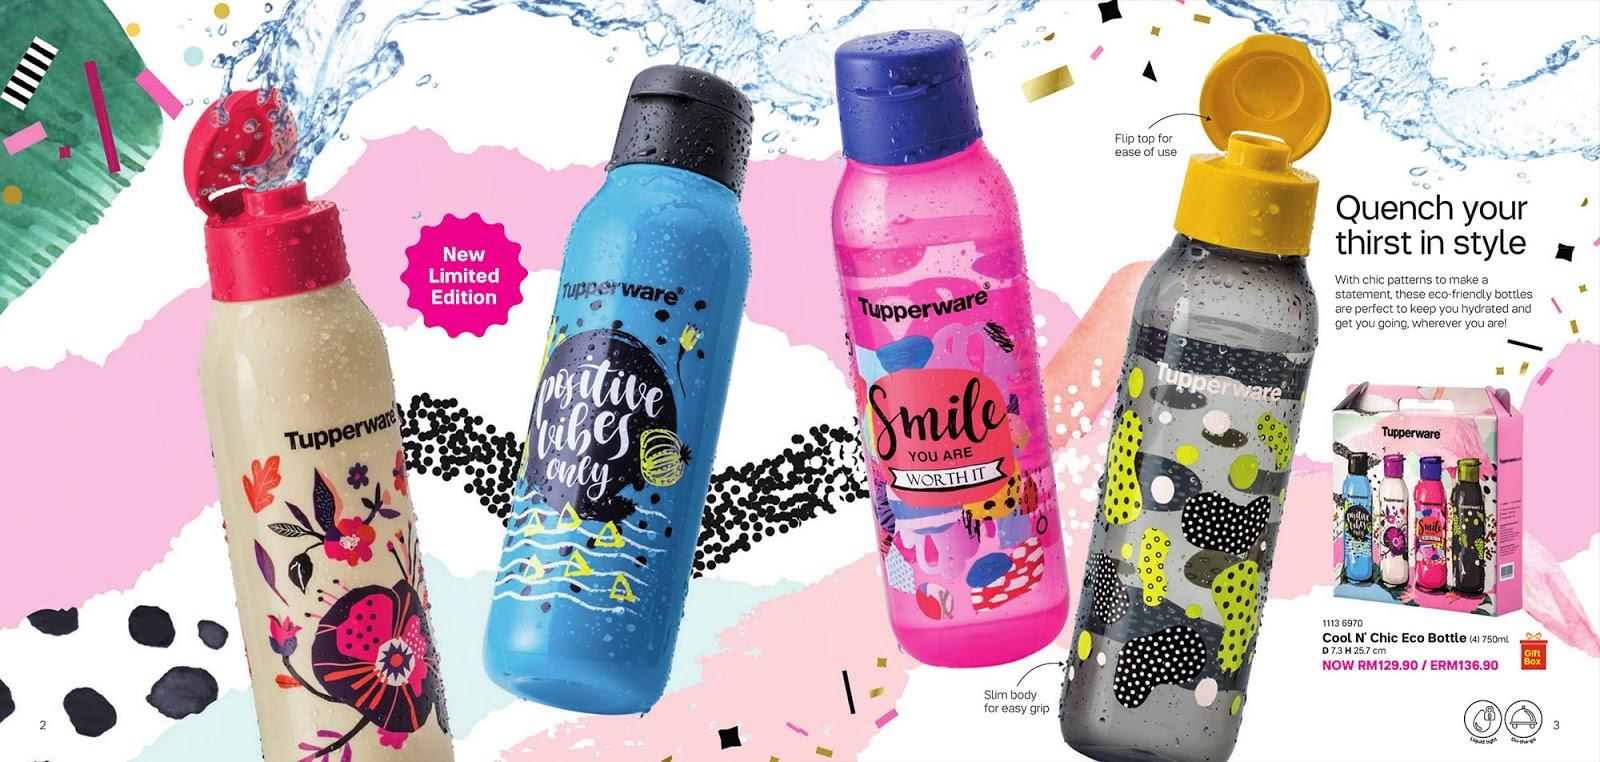 Harga Jual Tupperware Botol Minum Eco Xtreme Cafe Mug Disc Man Hitam 750 Ml Cenjaya Tuppy Malaysia Catalogue 2018 Edisi 2